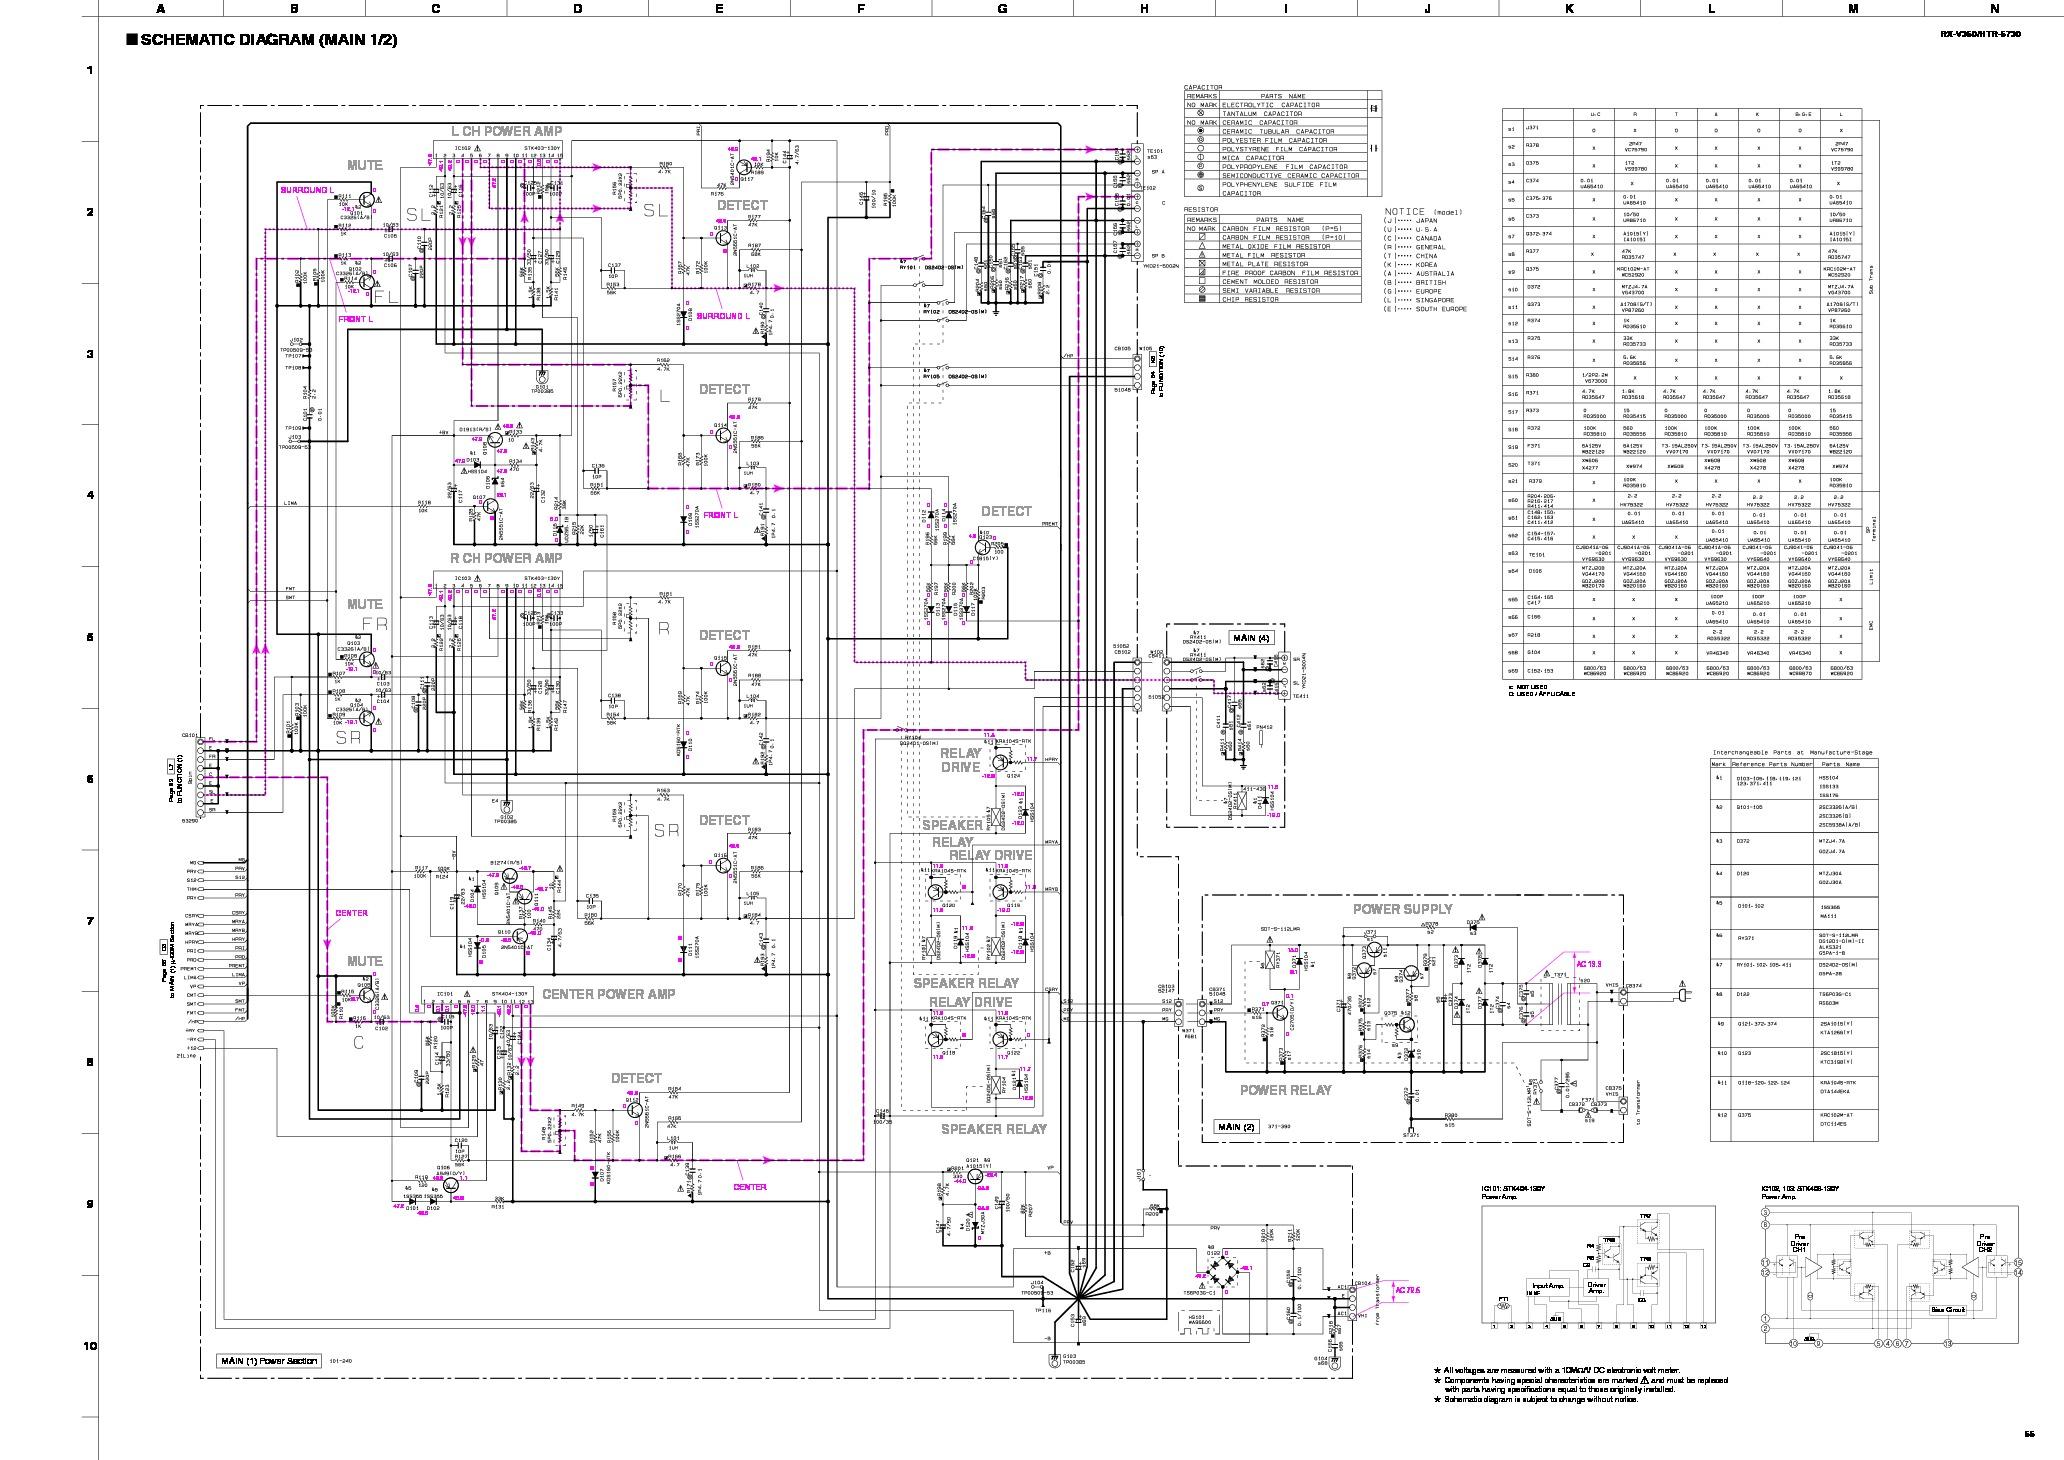 YAMAHA YAMAHA,modelo EMX660 YAMAHA,modelo EMX660 pdf